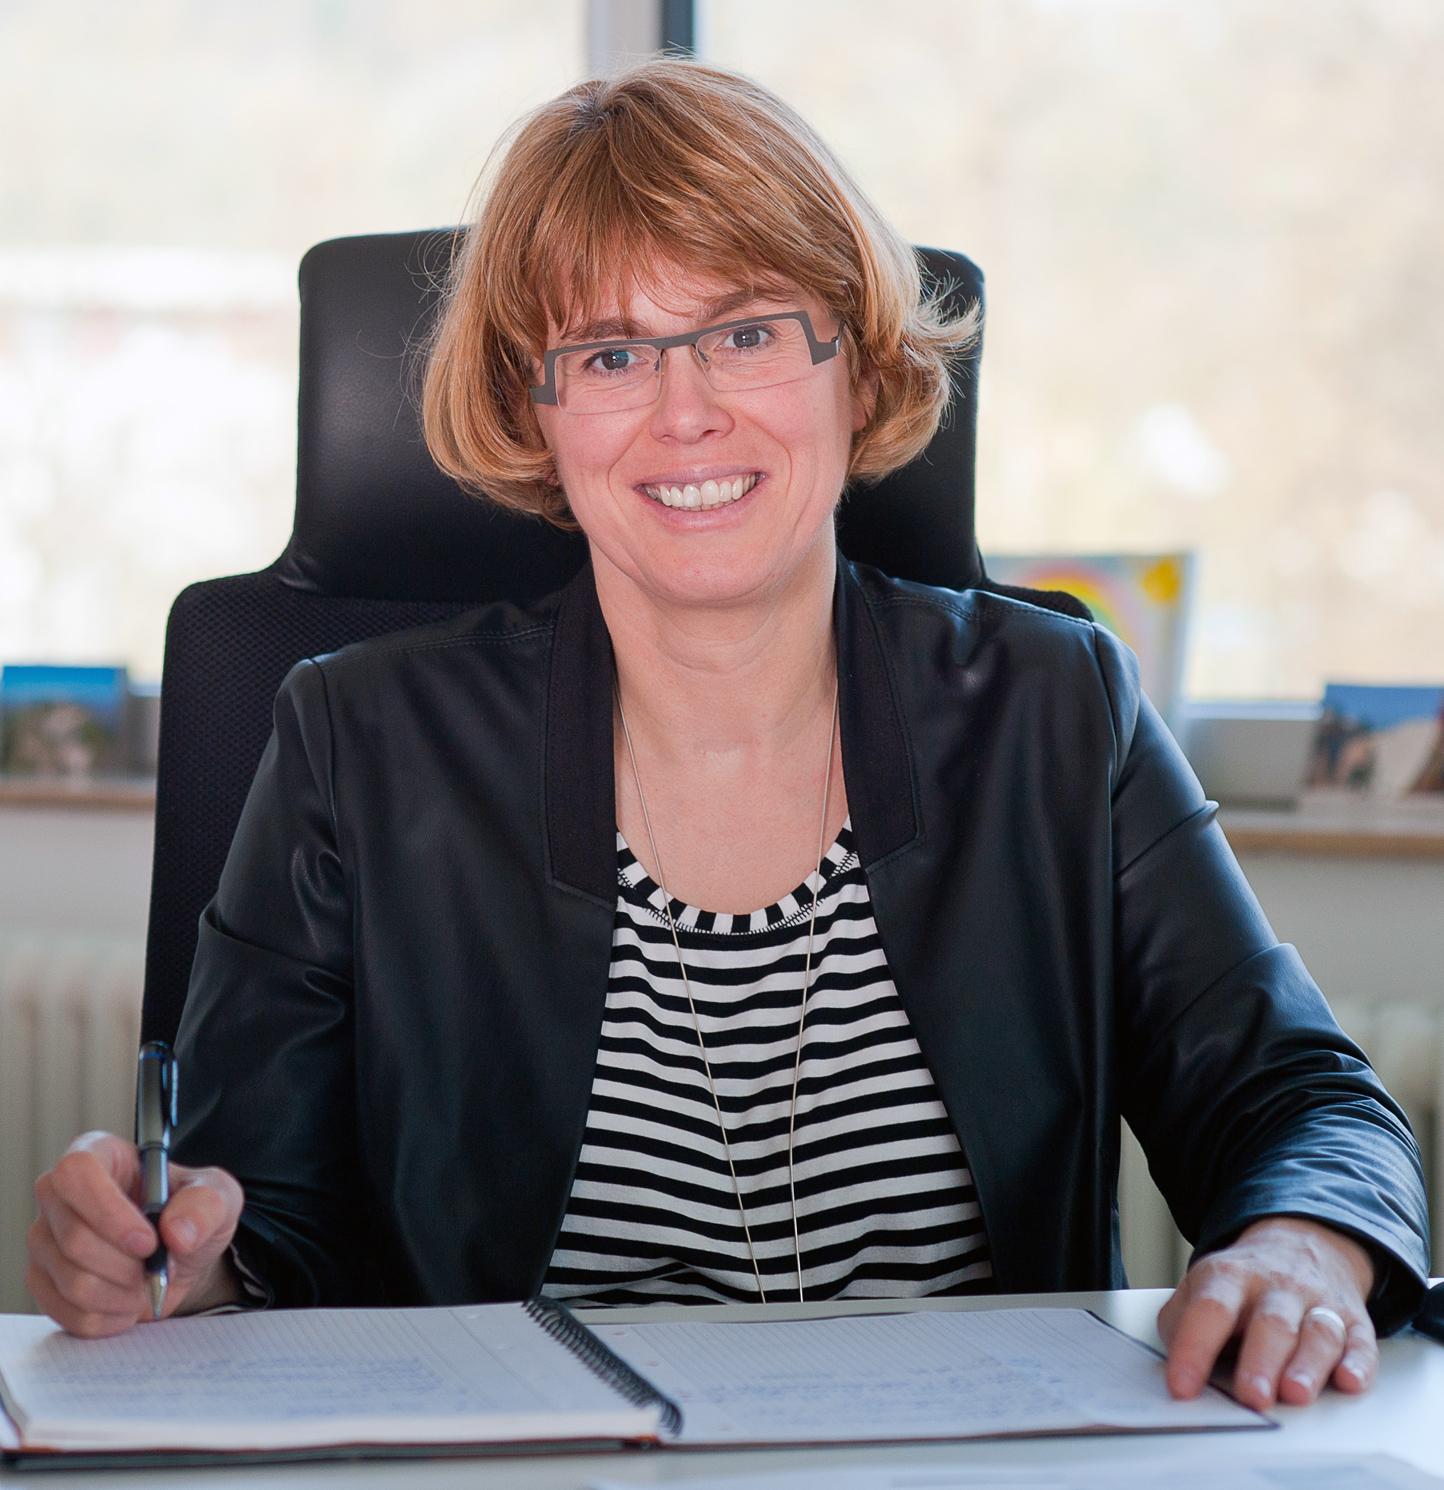 Bürgermeisterin Ute Seifried